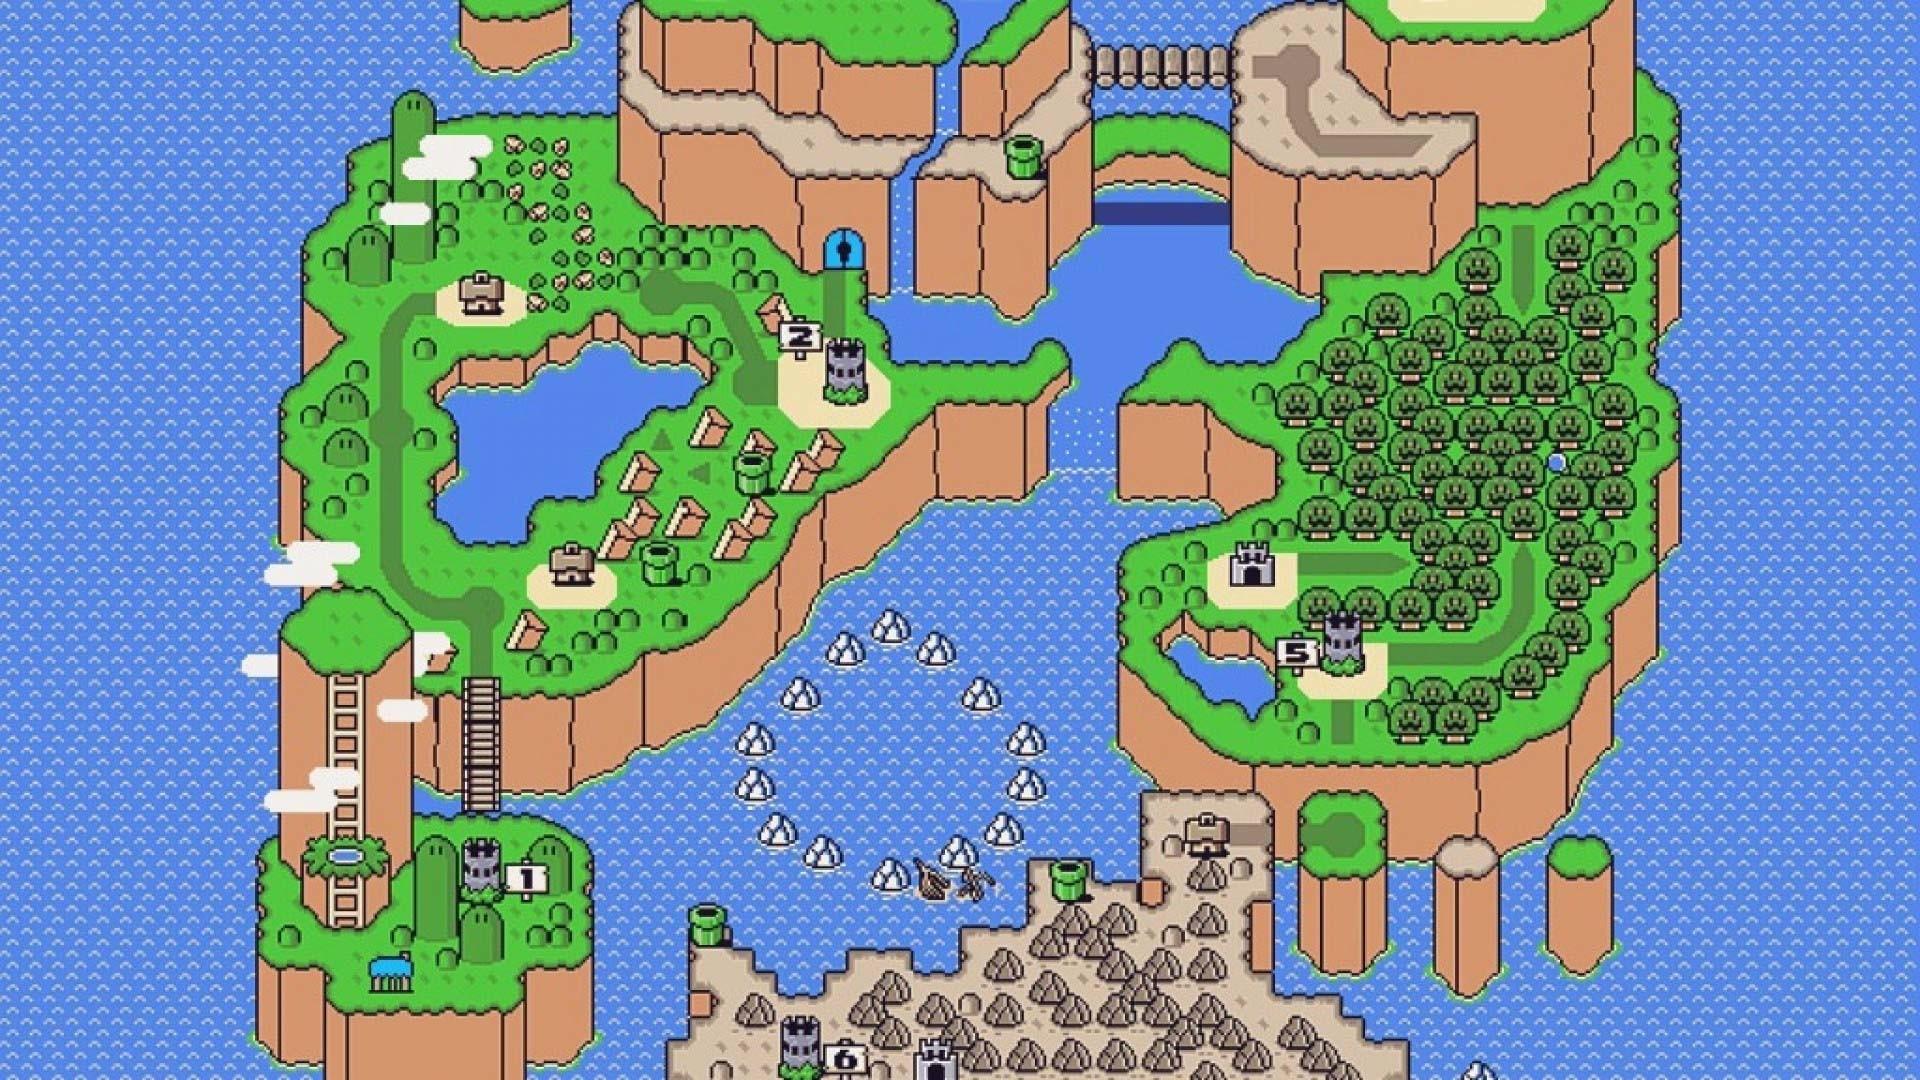 super mario world map wallpaper (56+ images)